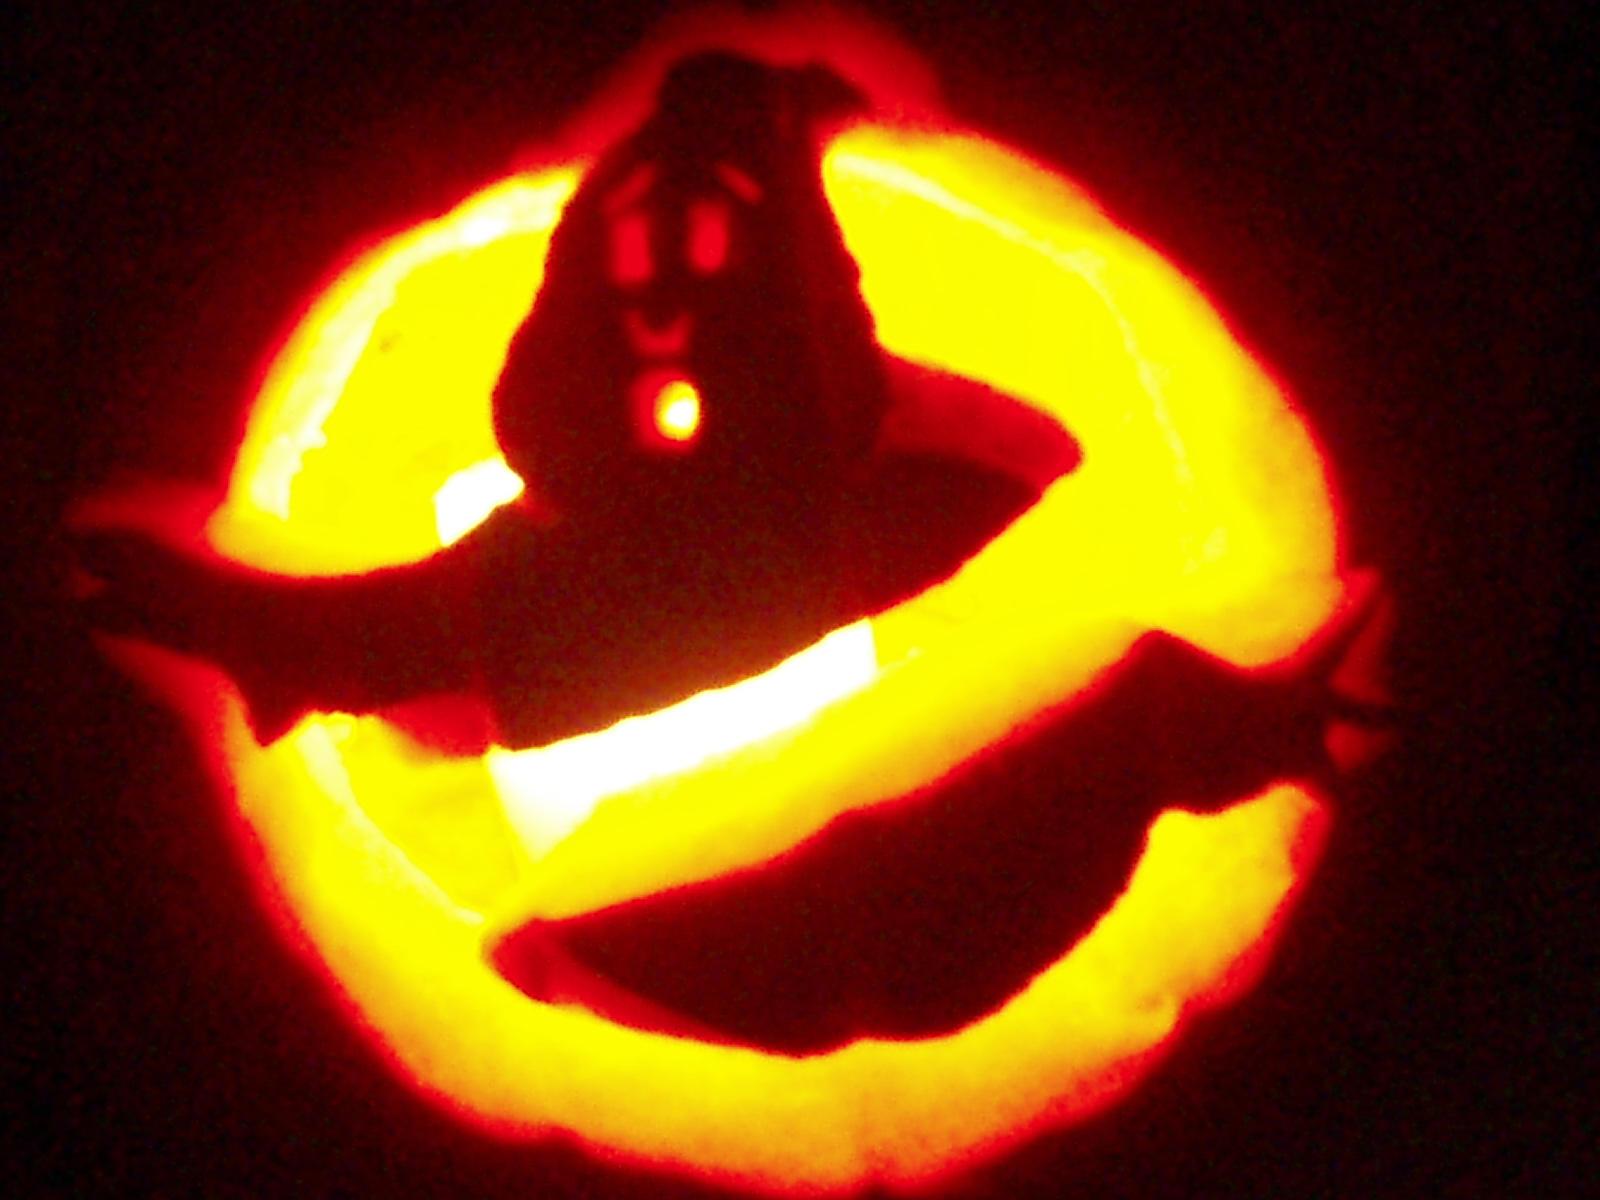 Ghostbusters by blackafter on deviantart